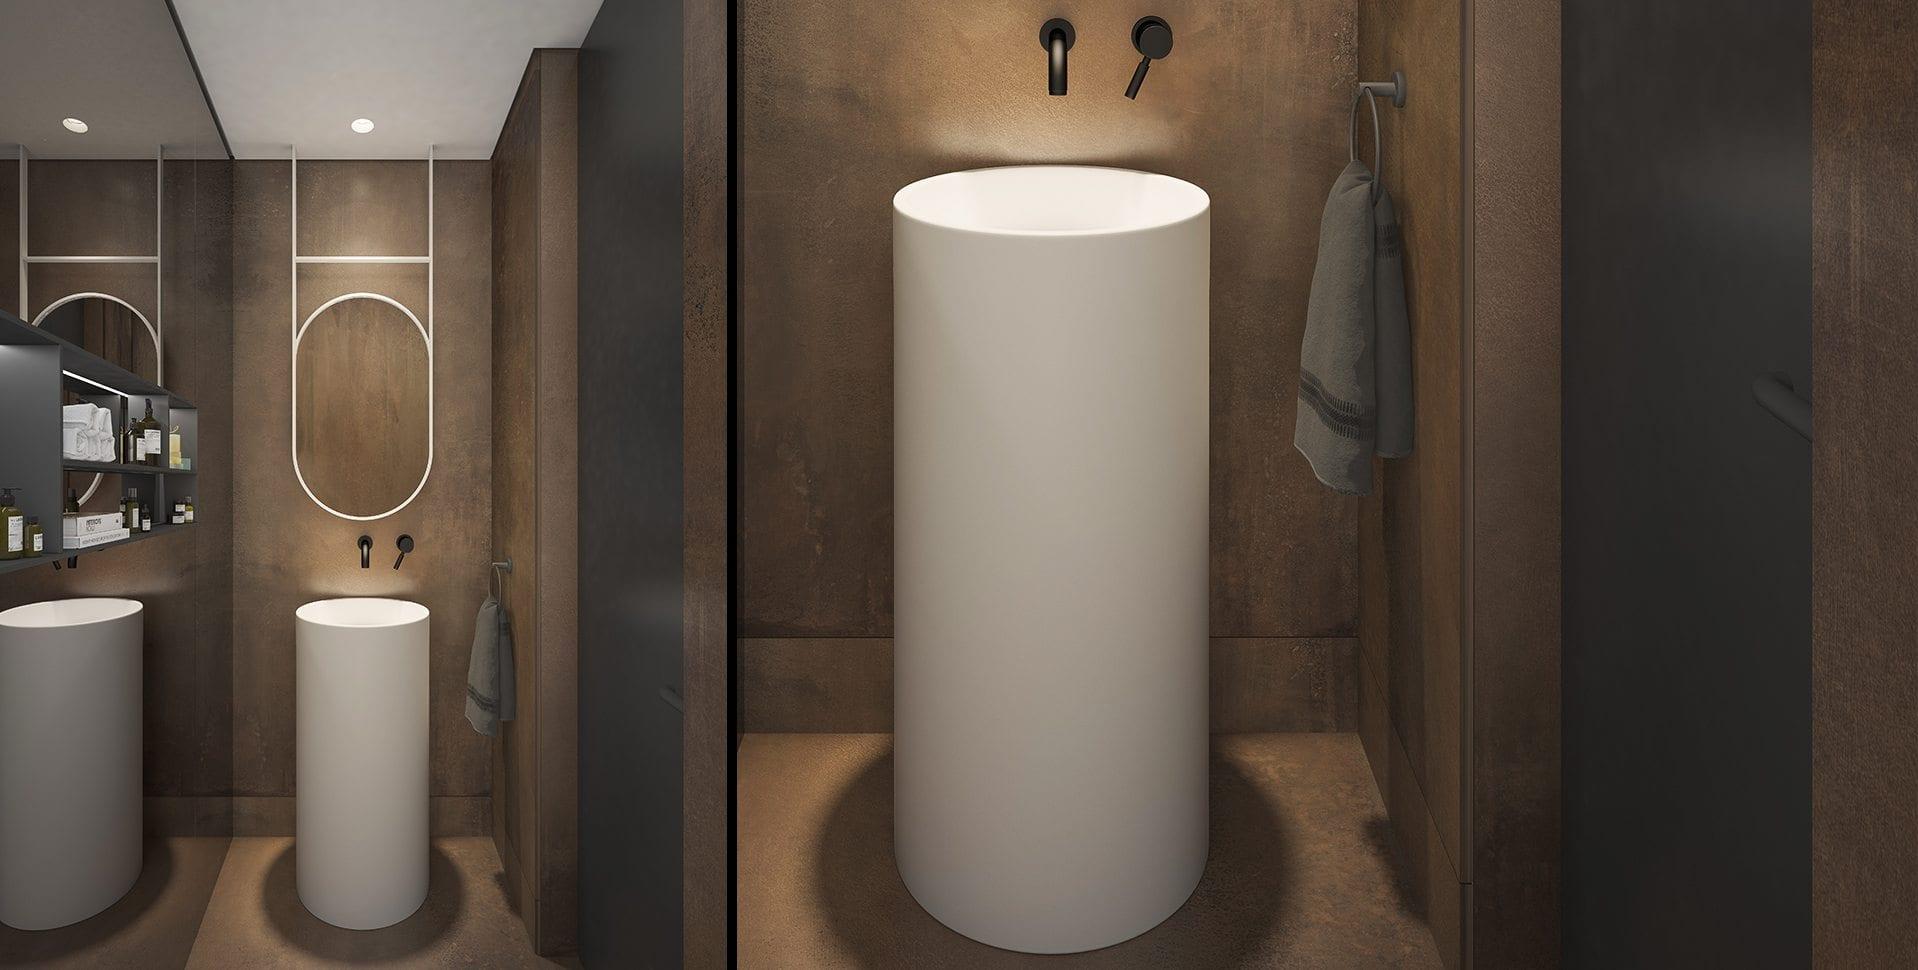 Maayan-Golan_Architectural-Visualization_toilet-interior-visualization_nehemia-project_ws-interior-design_01